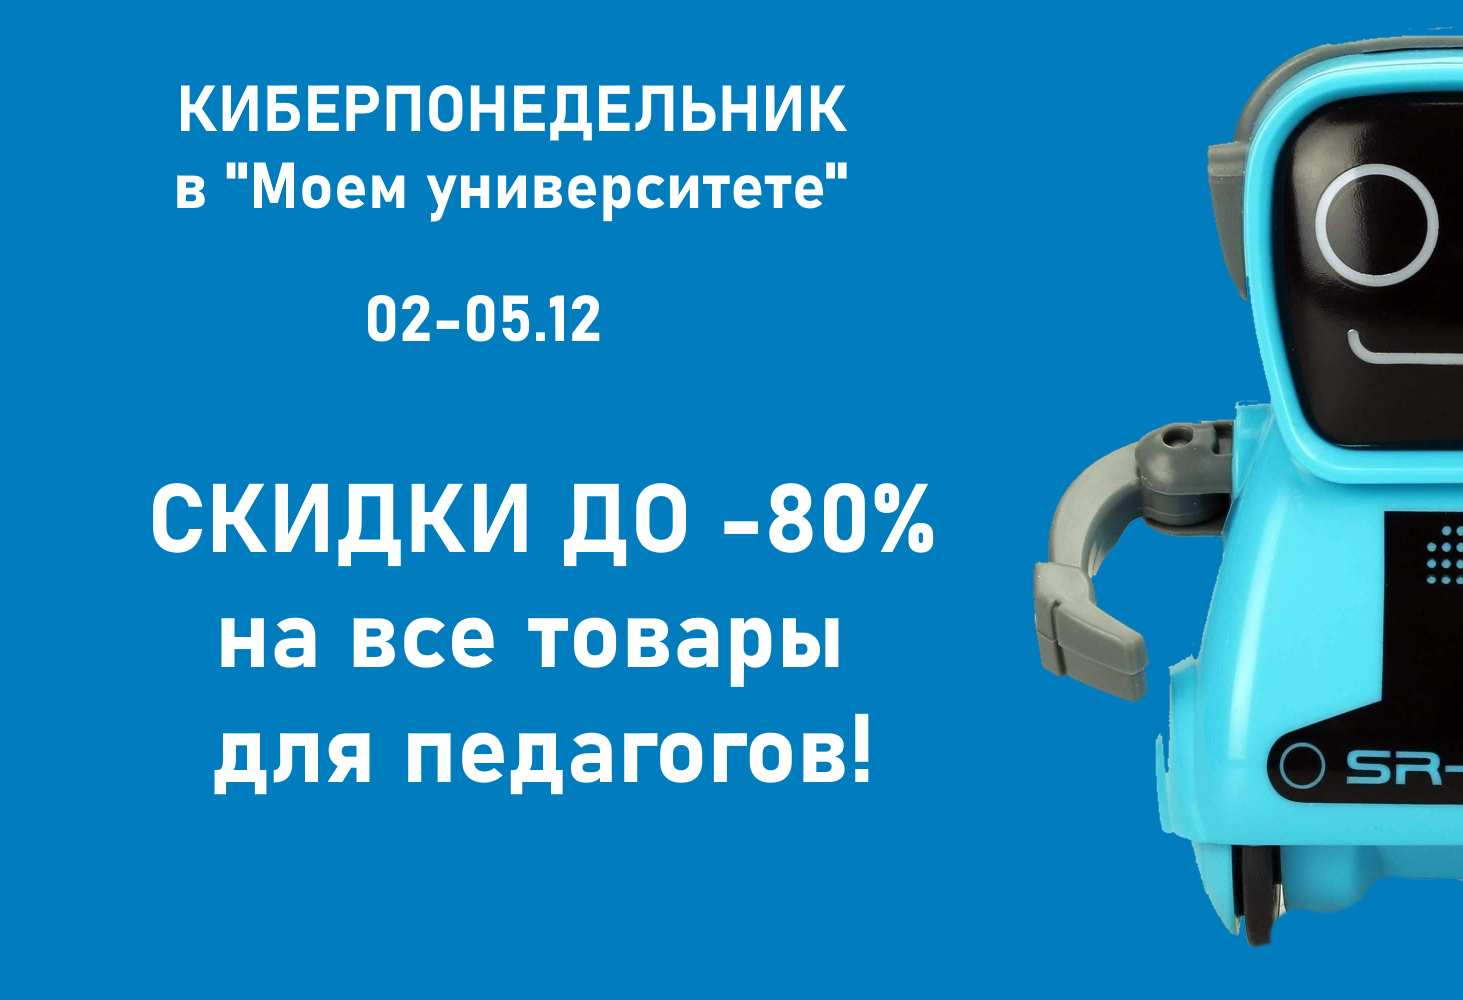 kiberponedelnik-skidki-do-80-na-vse-tovary-dlya-pedagogov